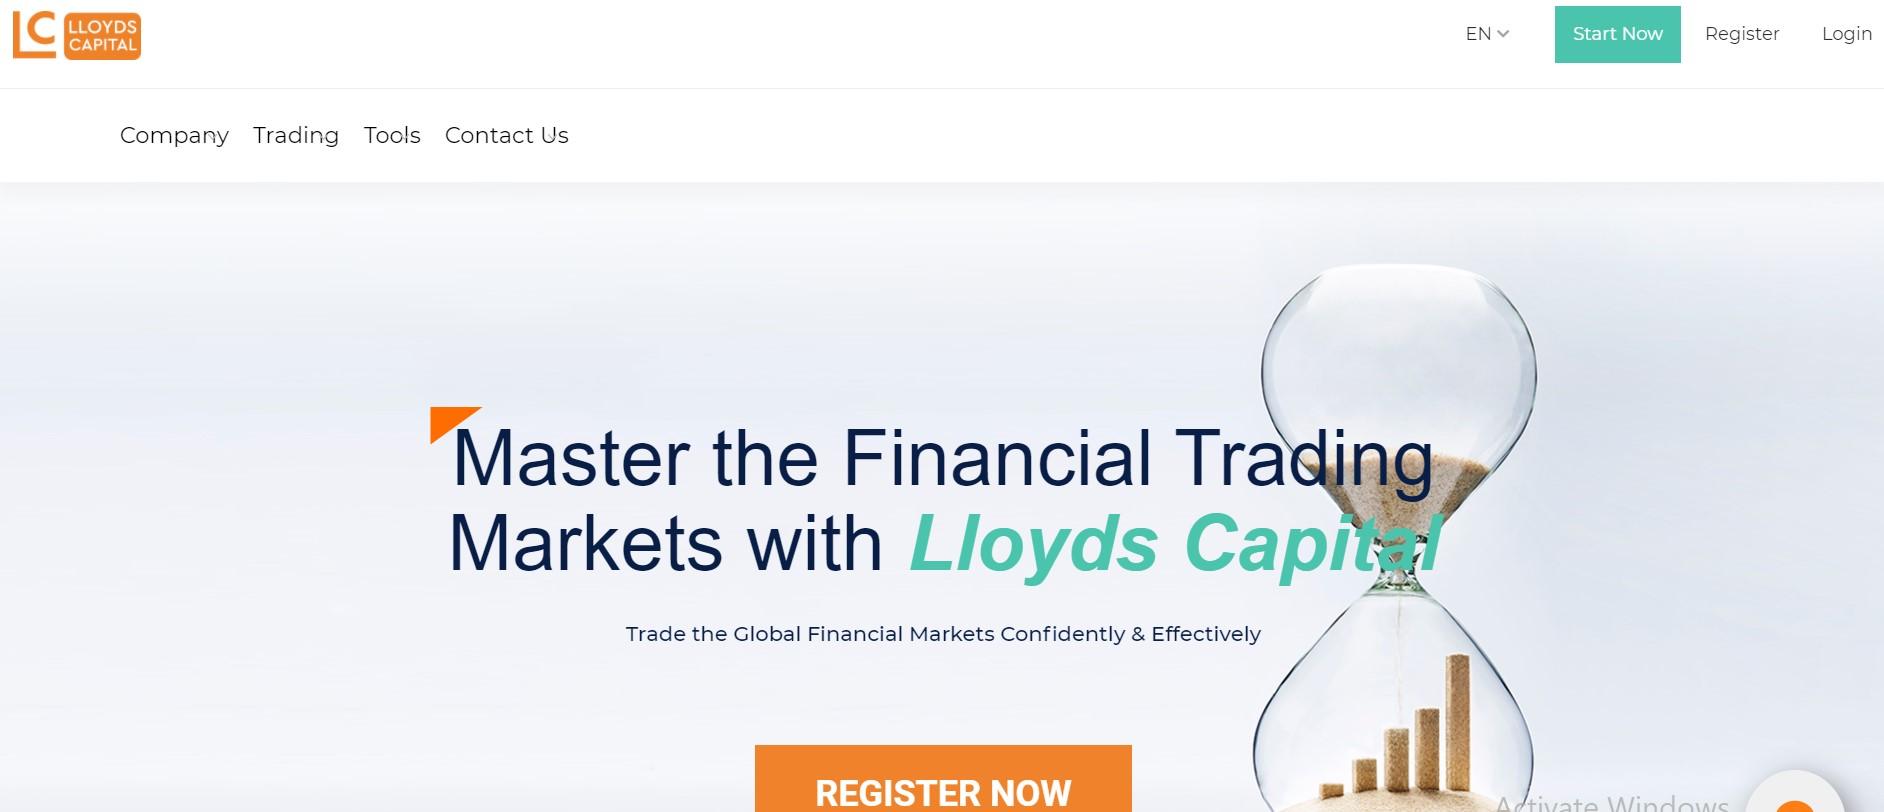 Lloyds-Capital website